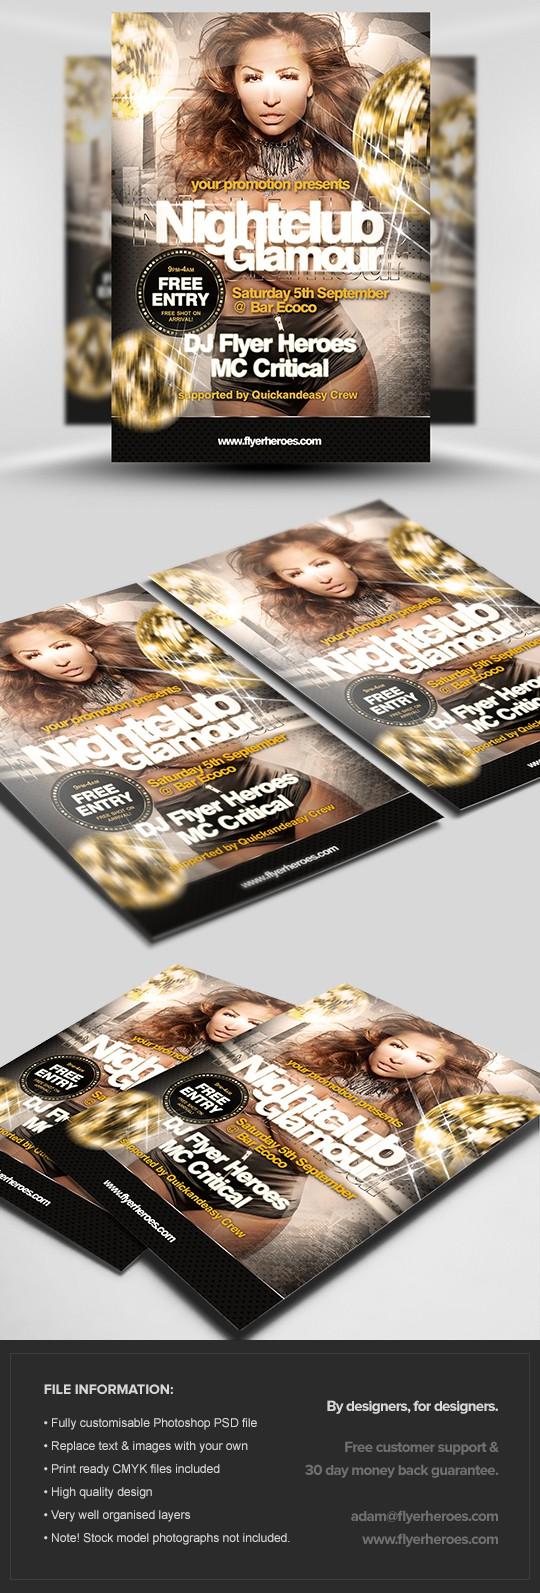 Nightclub Glamour Flyer Template